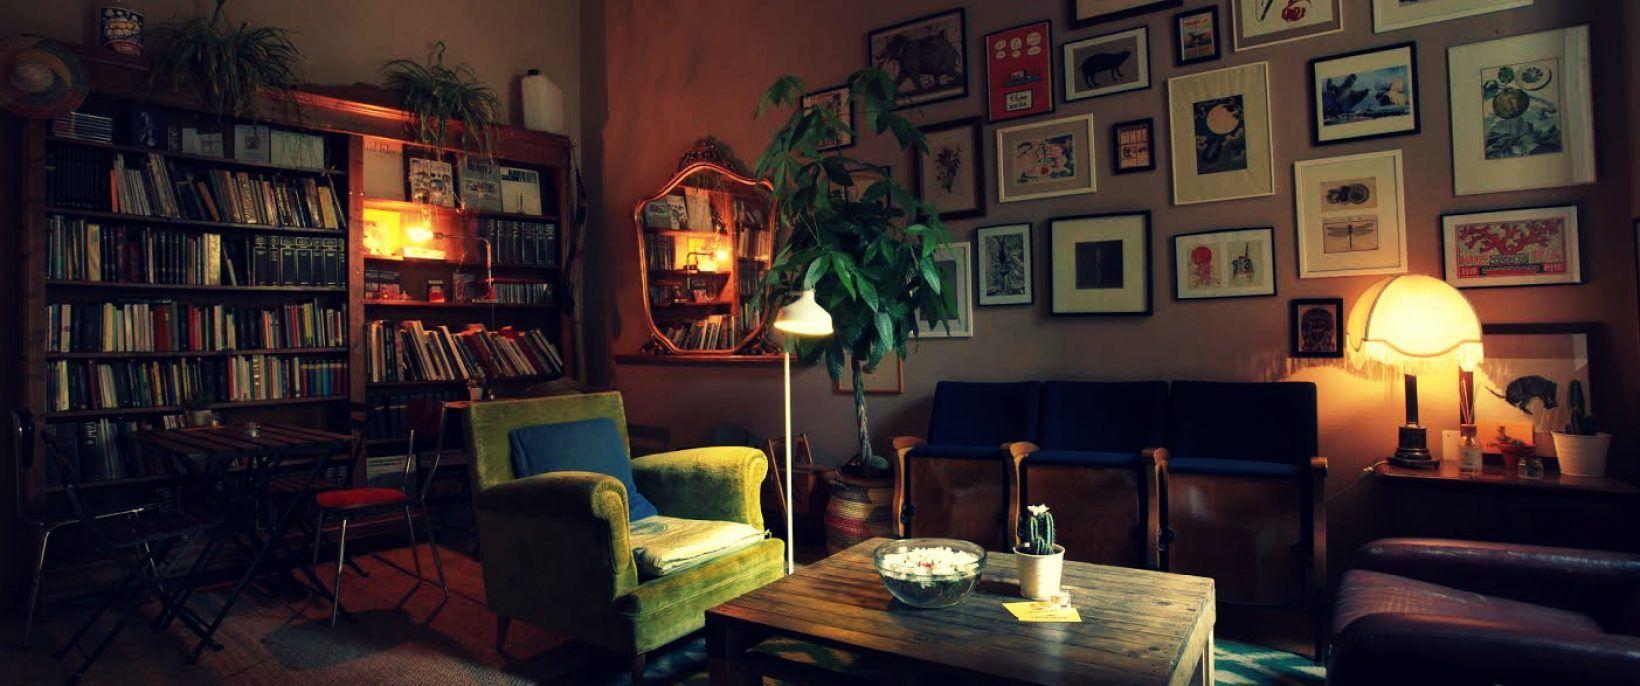 L'appartamento Firenze Appartamento, Firenze